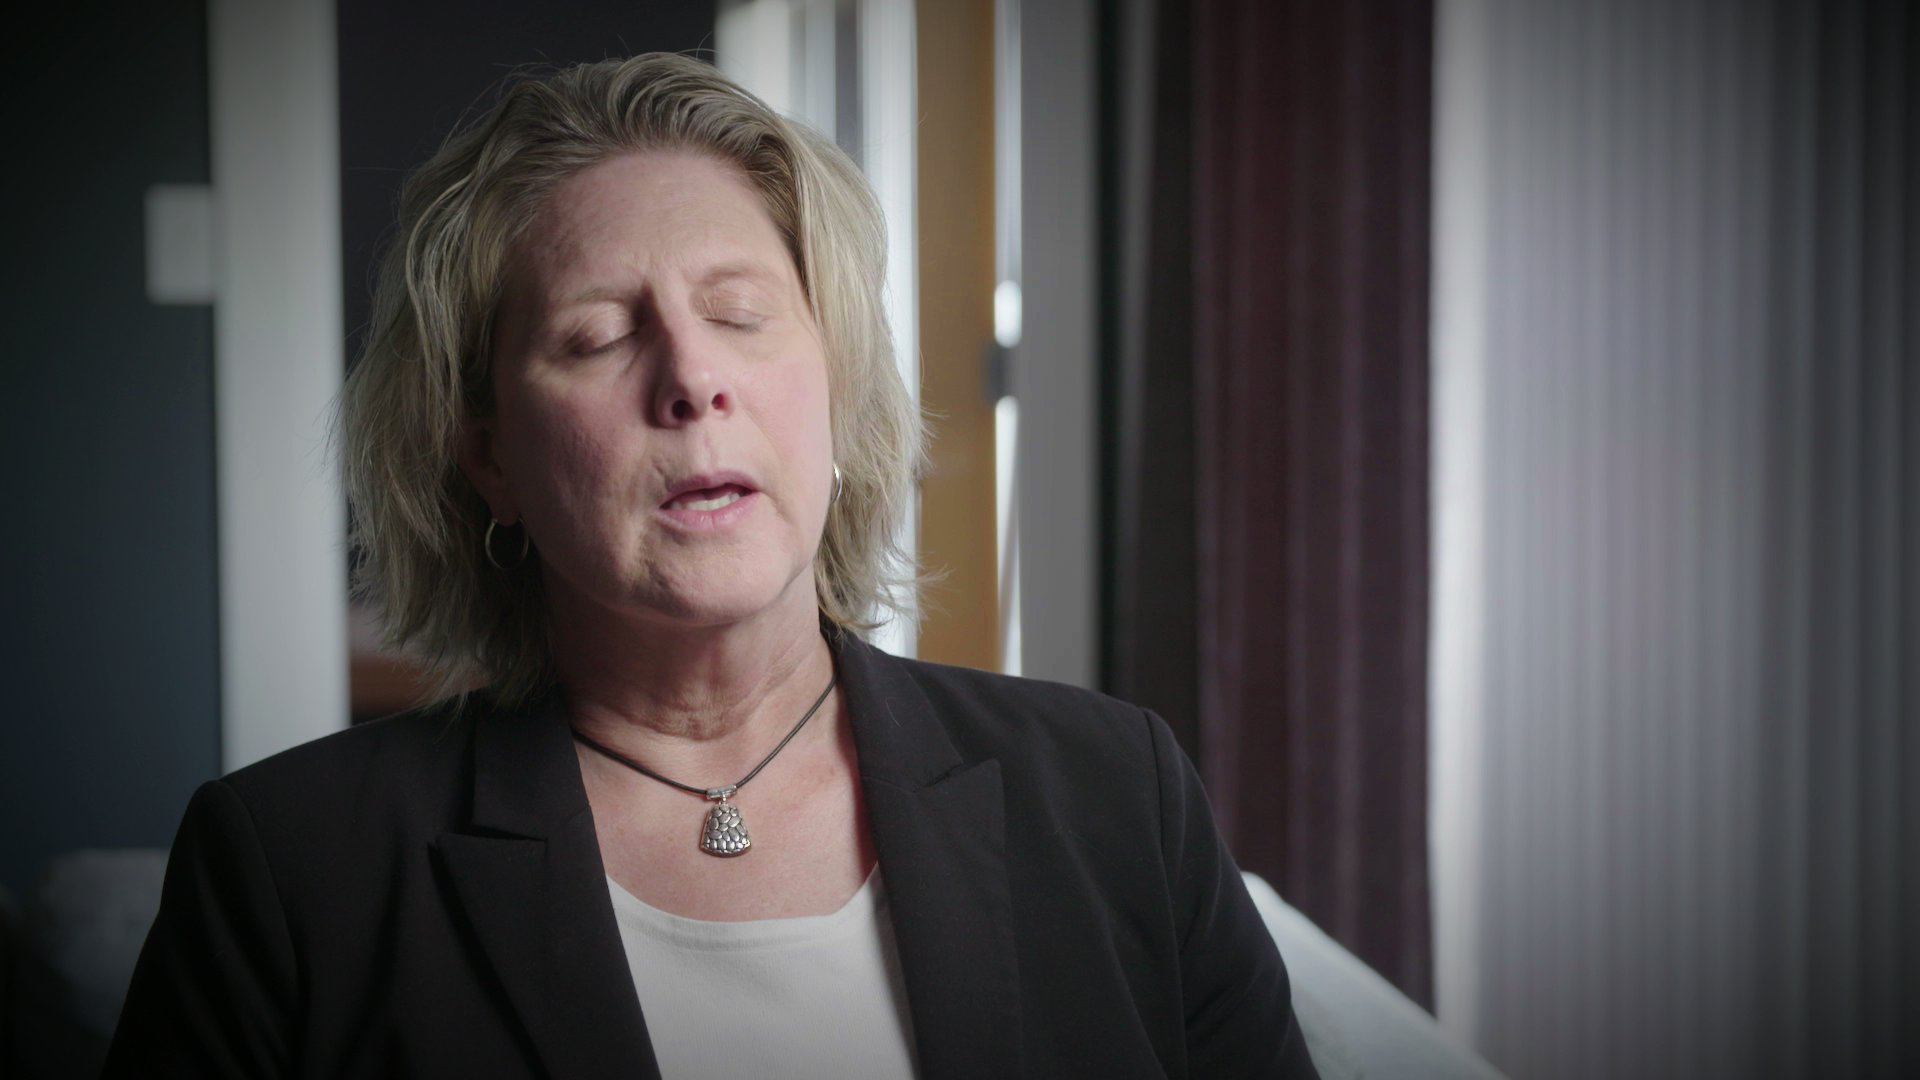 Bagaimana Hasil Catfishing Wanita Ini Dalam Pembunuhan Laut Tidak Bersalah?